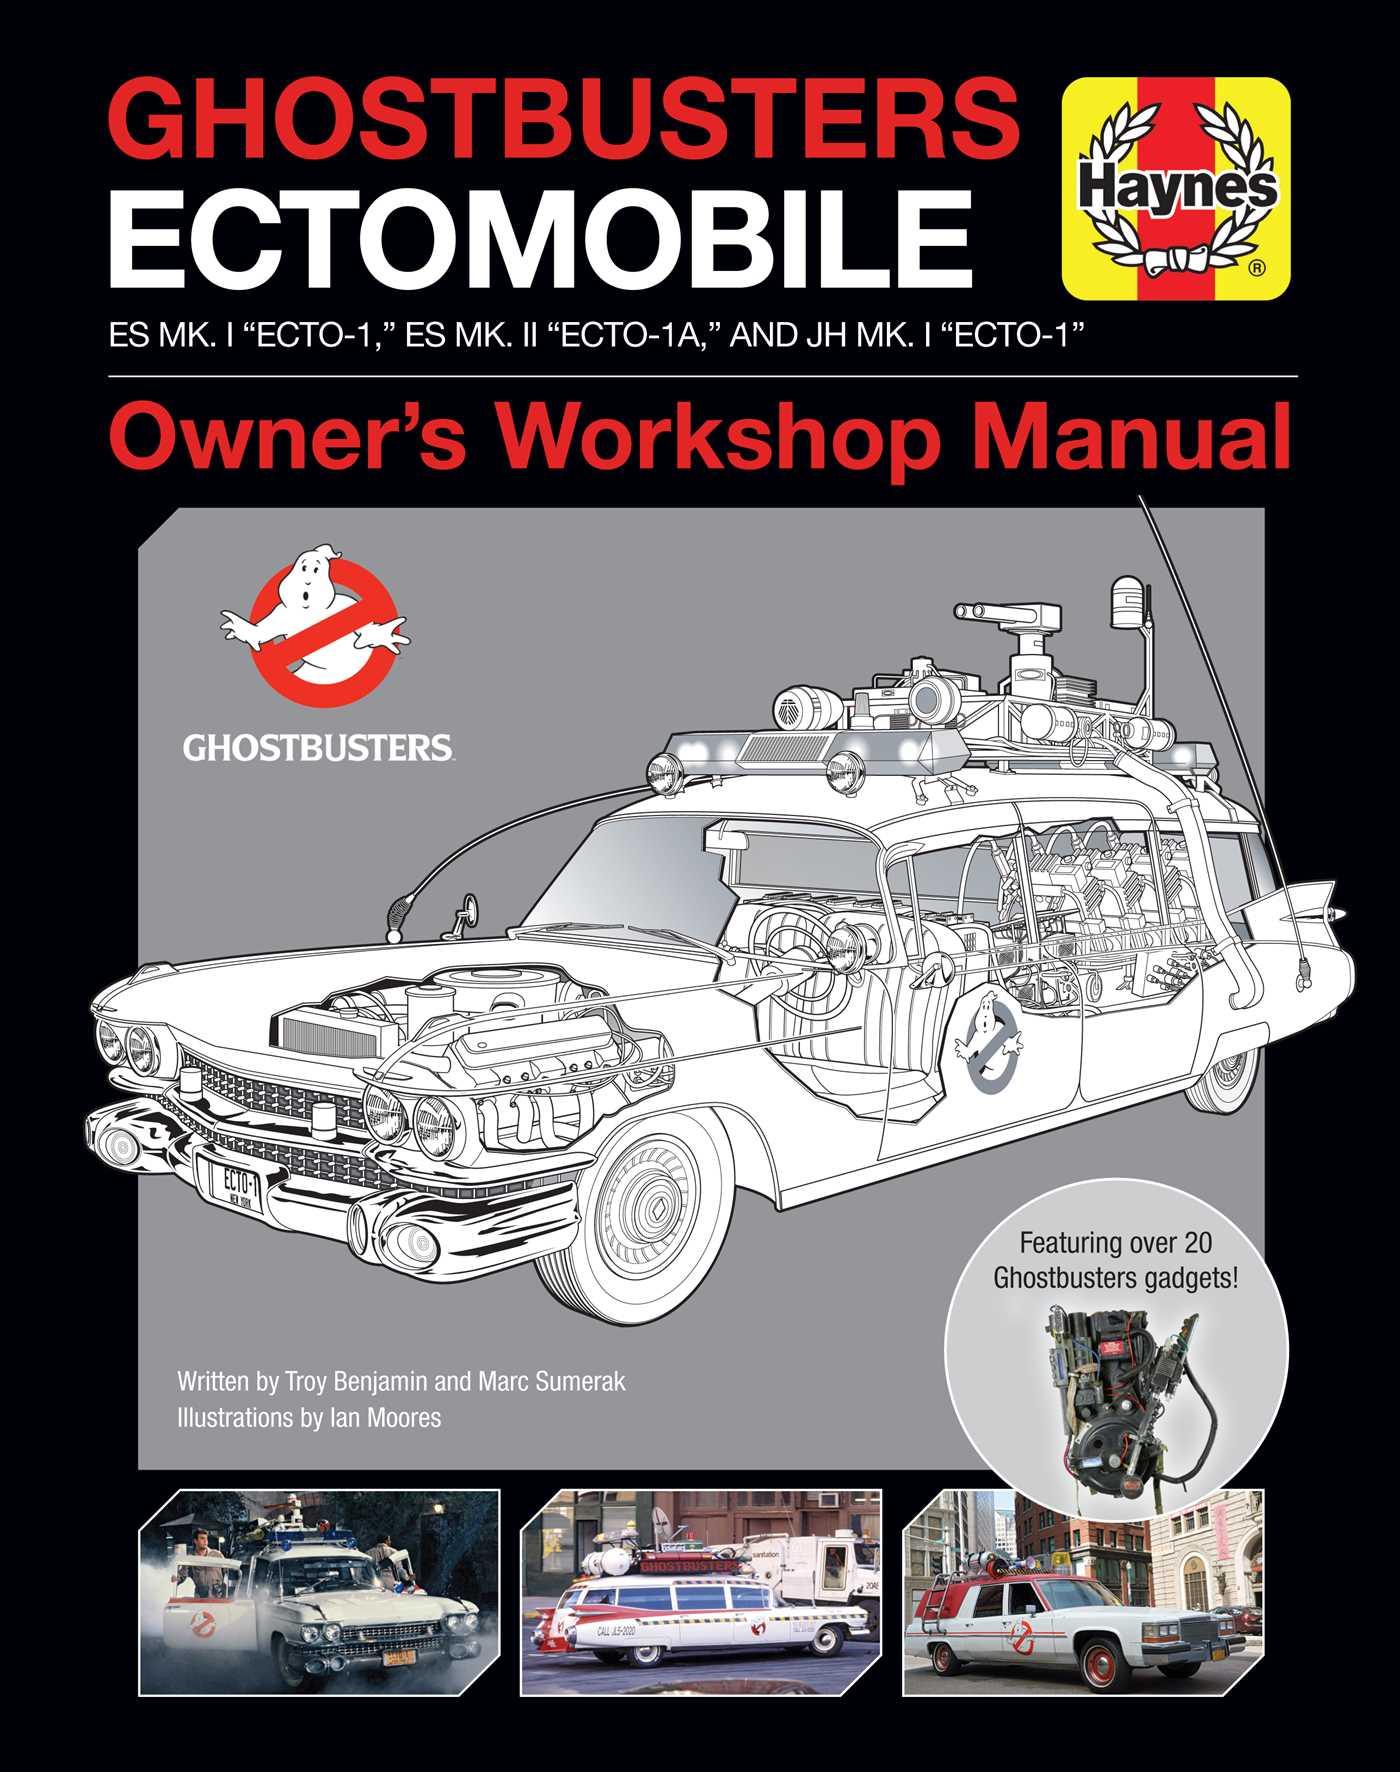 ghostbusters-ectomobile-9781608875122_hr copy.jpg